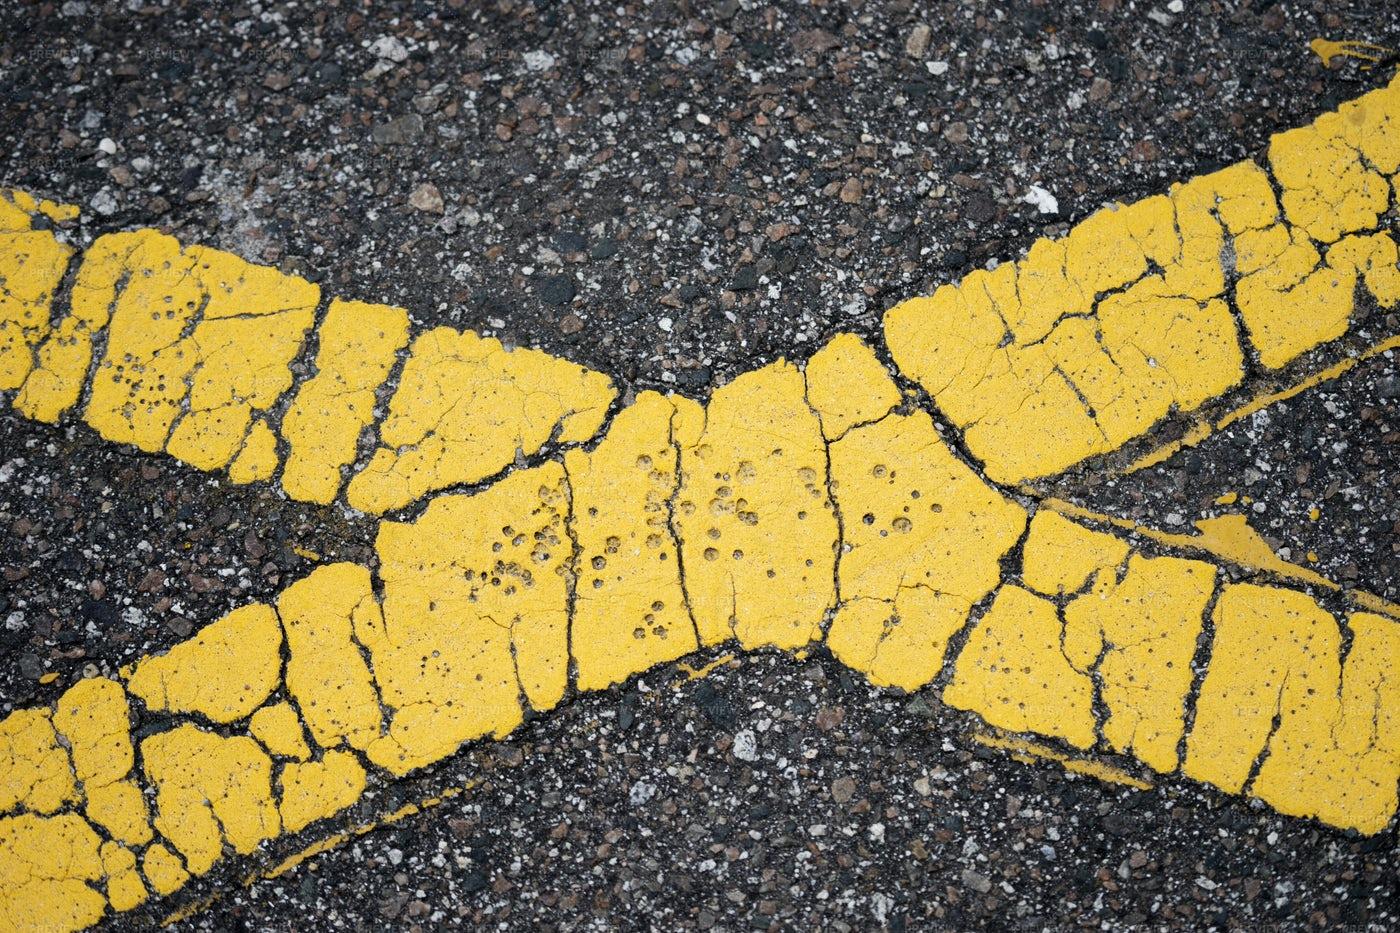 Yellow Cross On Asphalt: Stock Photos